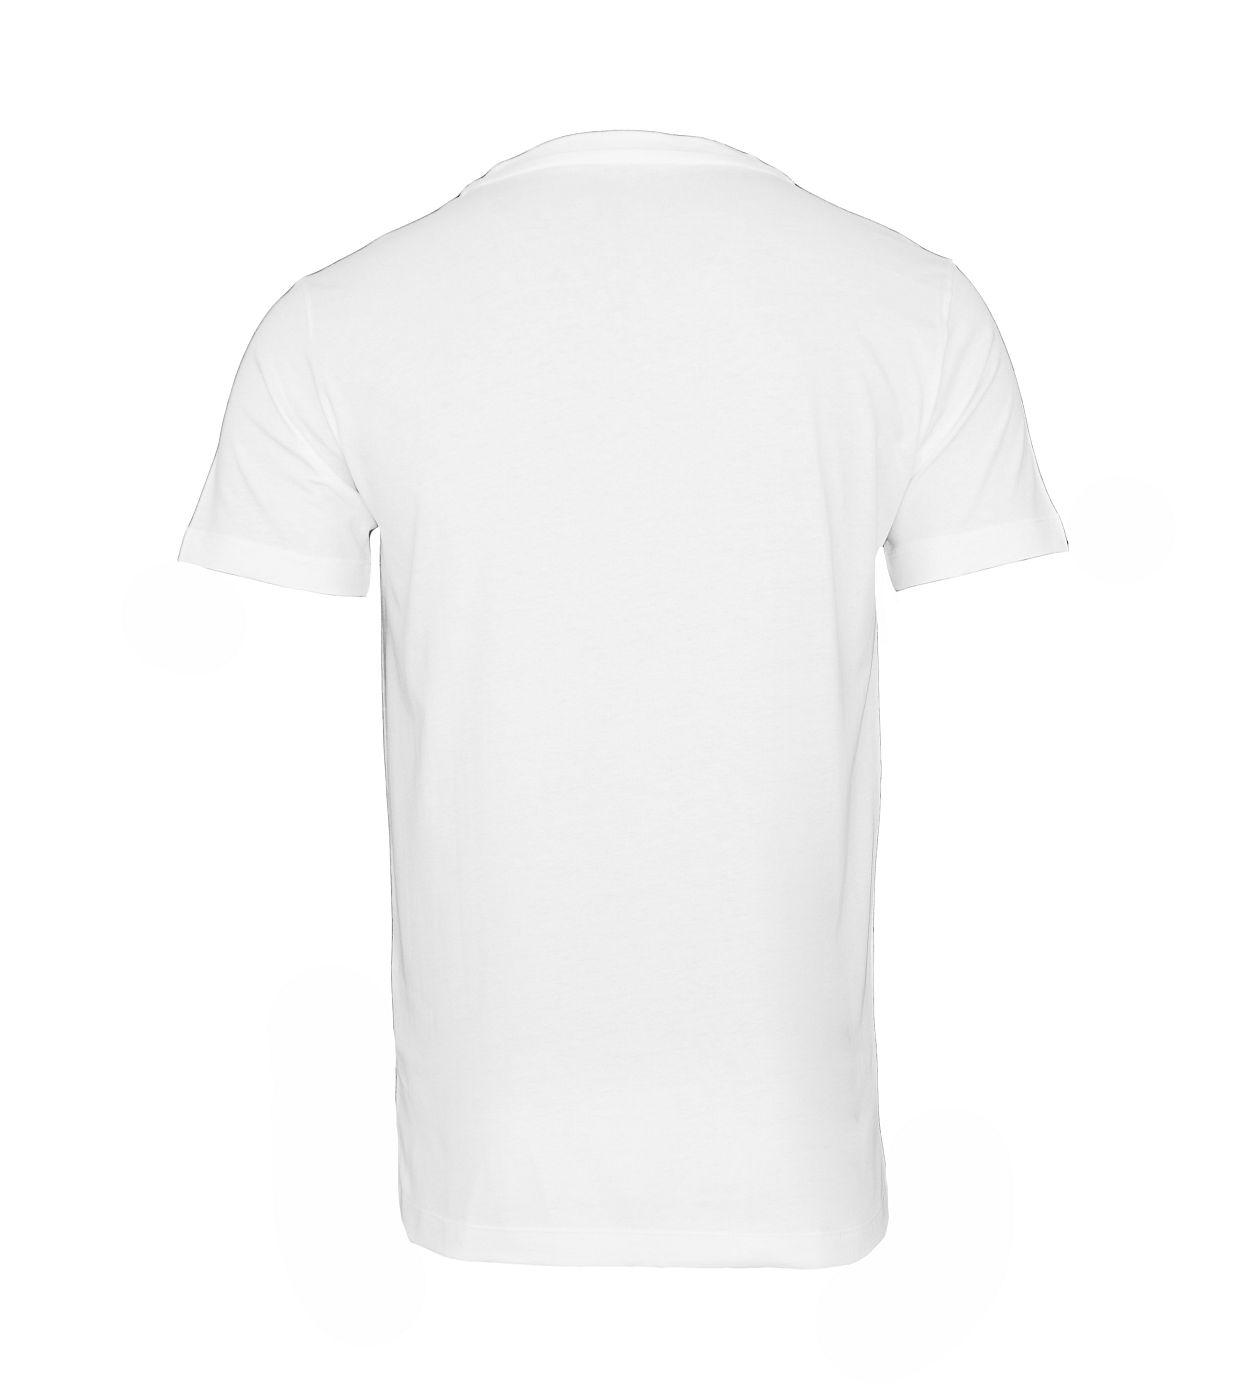 Replay 2er Pack T-Shirts V-Ausschnitt M3589 22602 040 black, white S18-RPT1